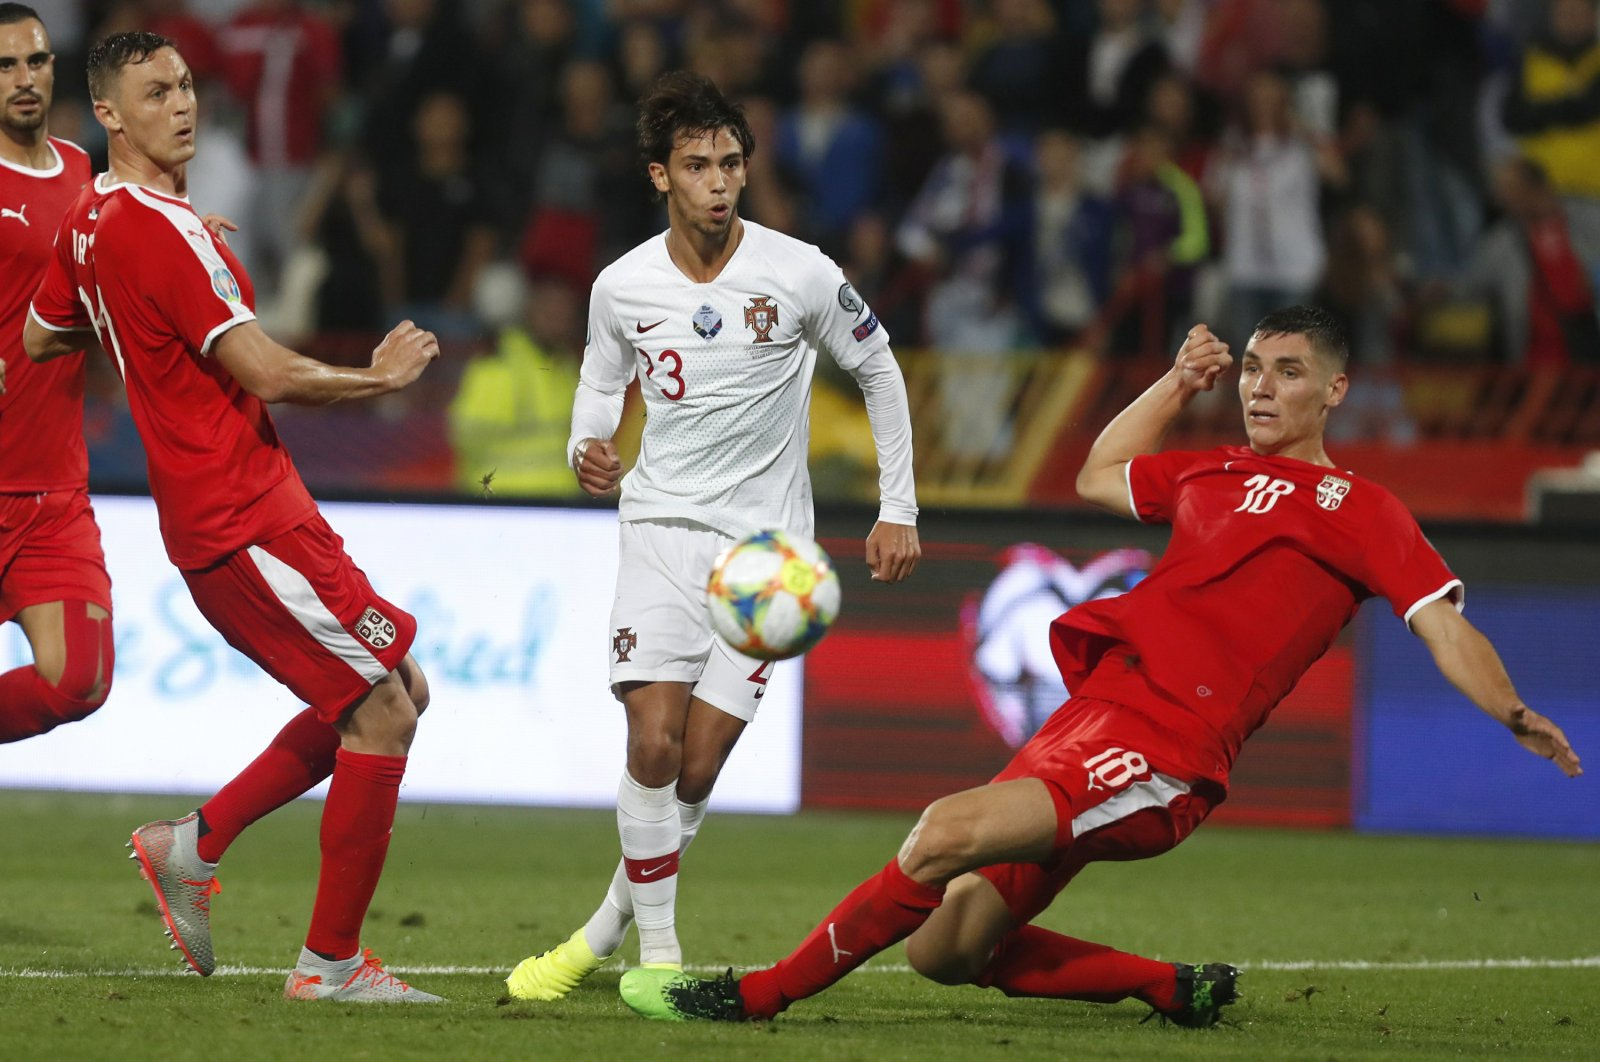 Portugal's Joao Felix, center, kicks the ball ahead of Serbia's Nemanja Matic, left, and Serbia's Nikola Milenkovic during the Euro 2020 group B qualifying match between in Belgrade, Serbia, Sept. 7, 2019. (AP Photo)